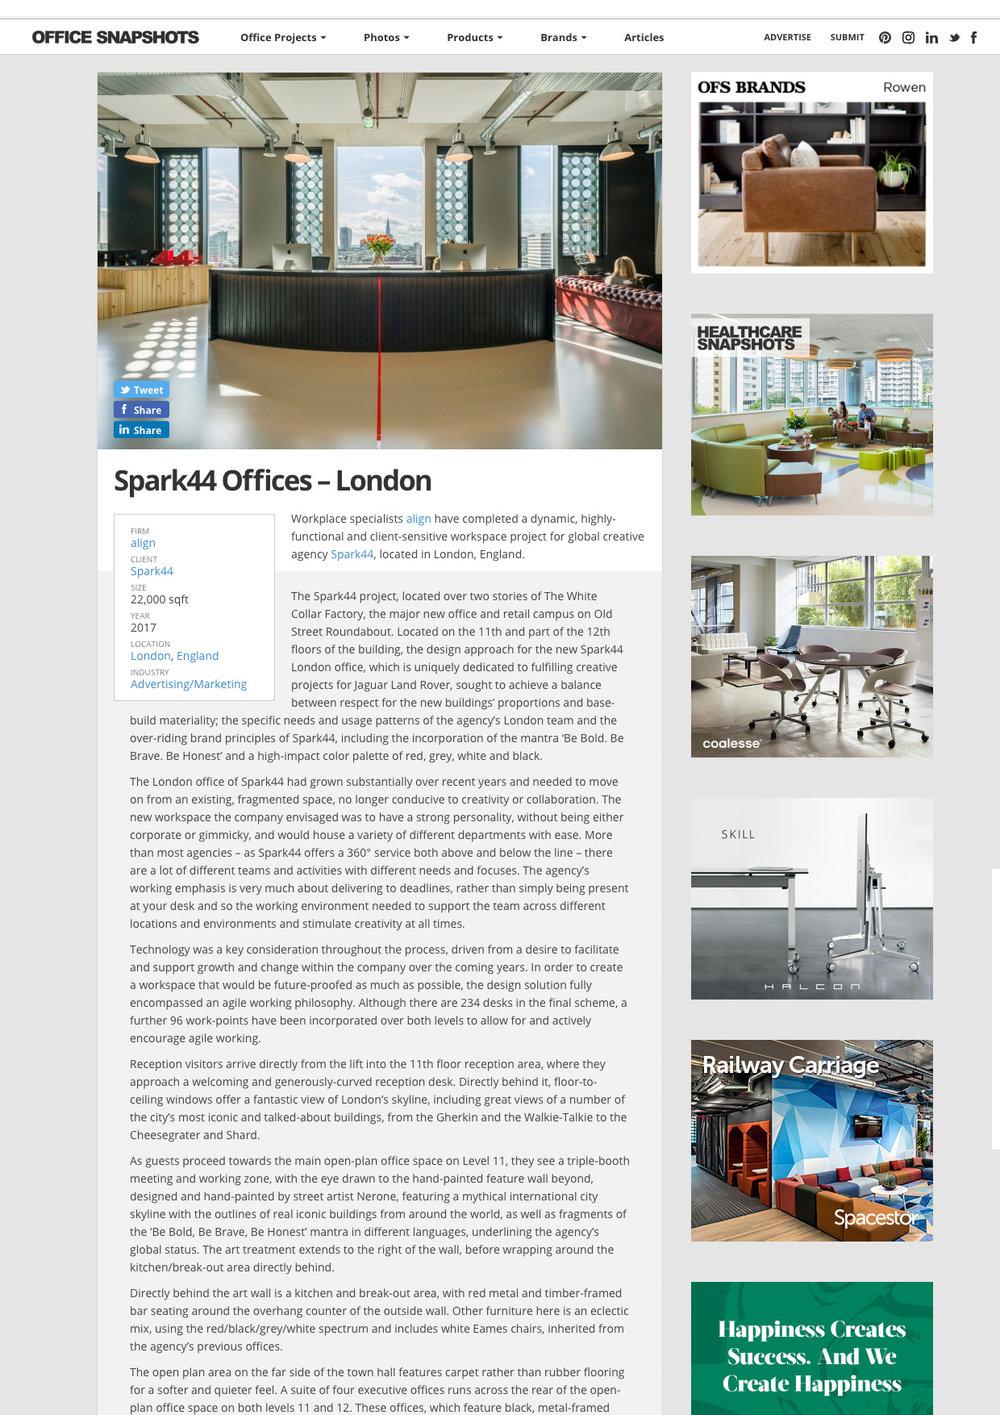 Press-7---Office-Snapshots.jpg